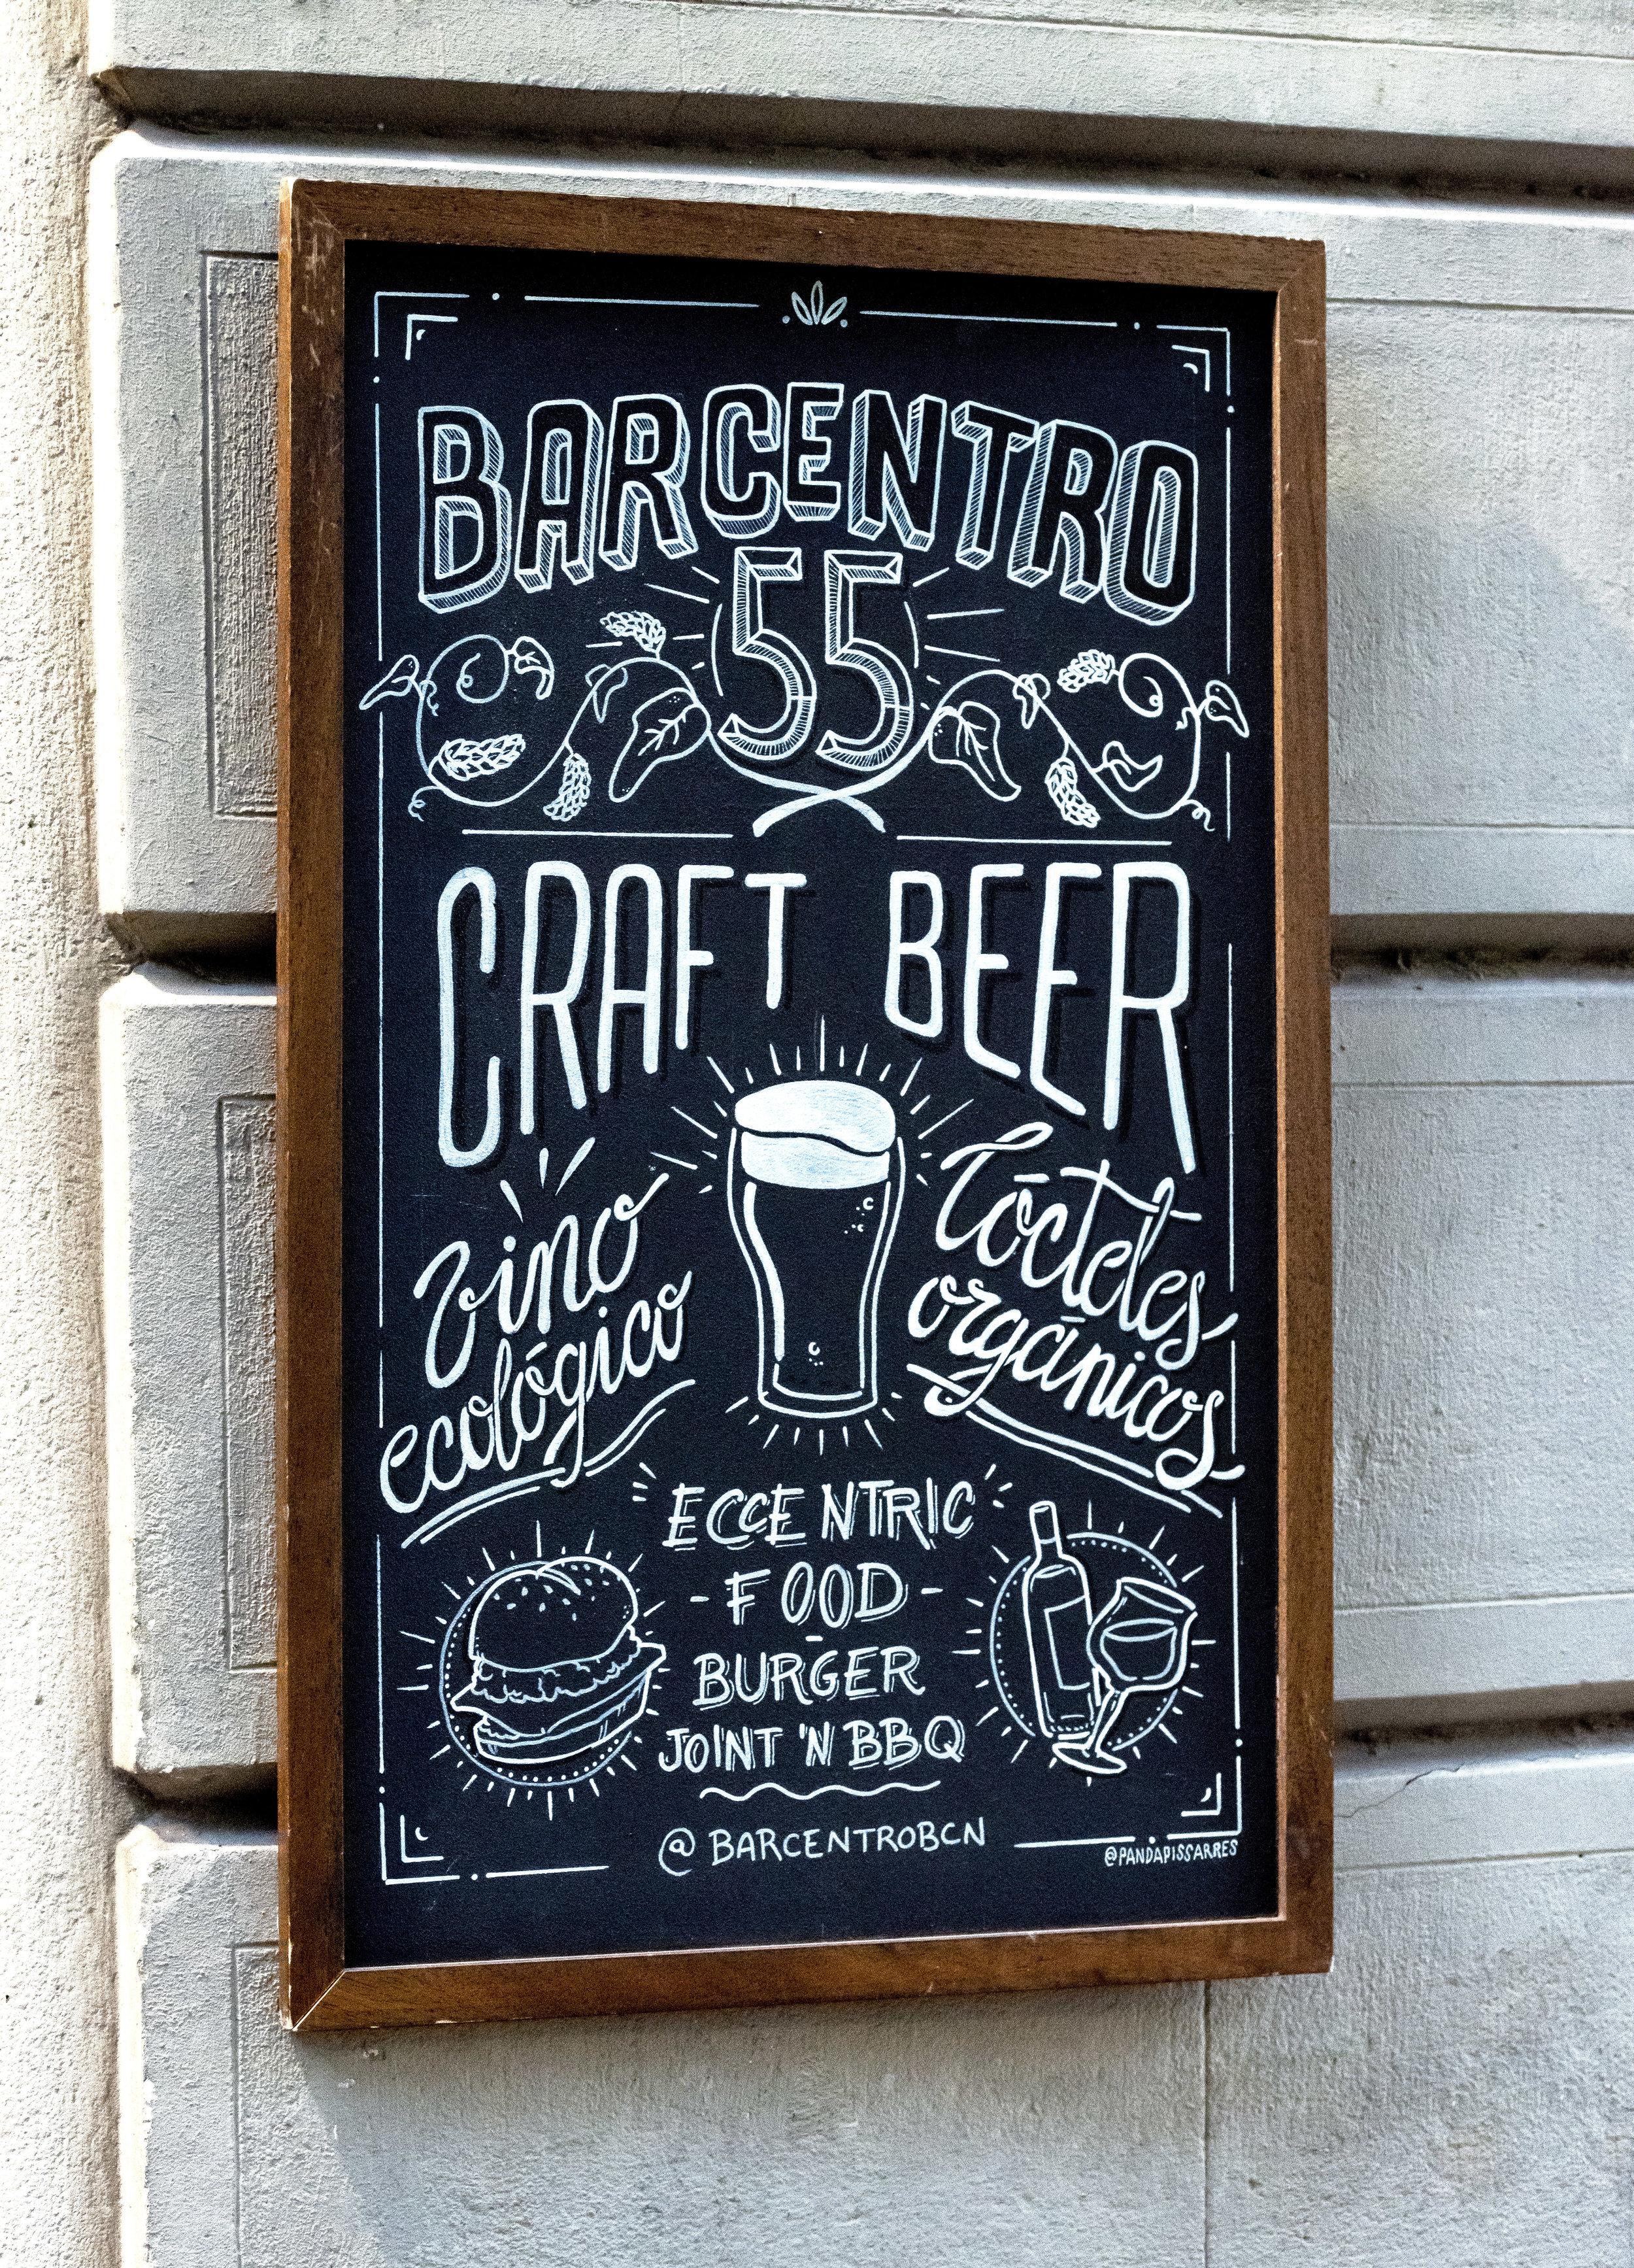 Bar Centro, Barcelona (photo Øhm Sweet Øhm)